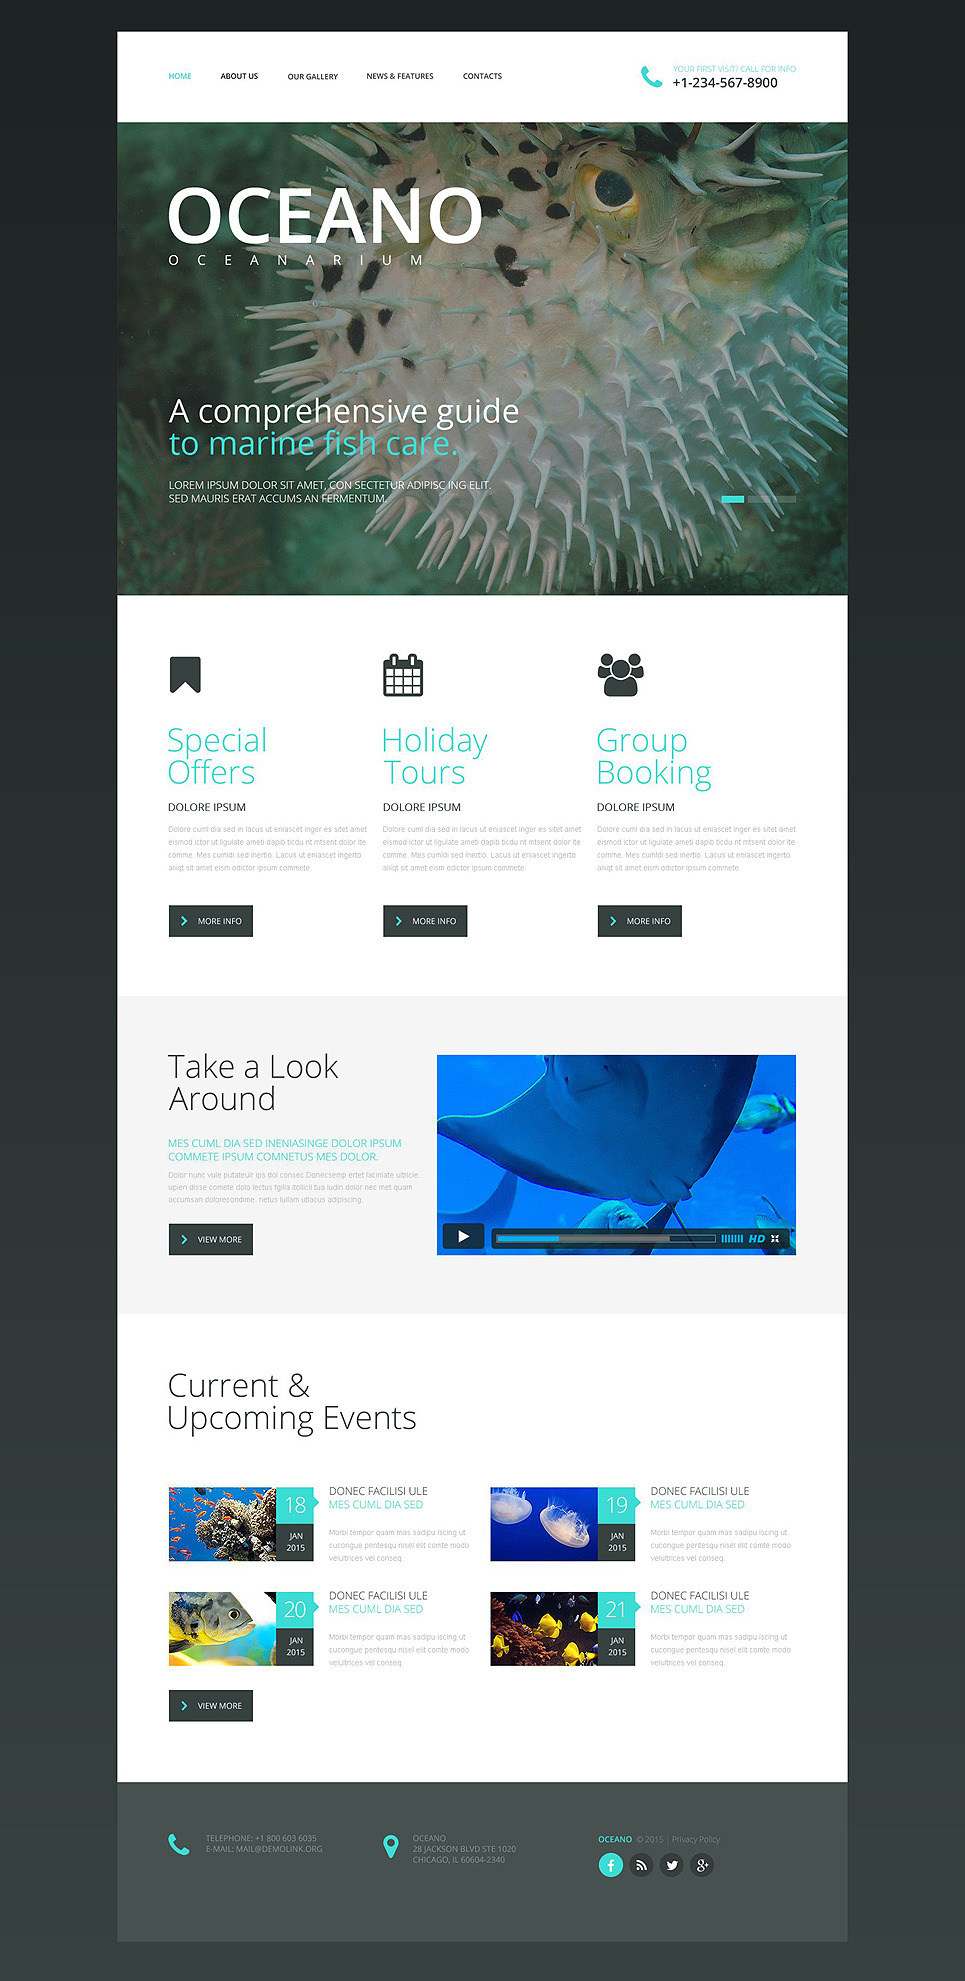 Oceanarium Website Template New Screenshots BIG